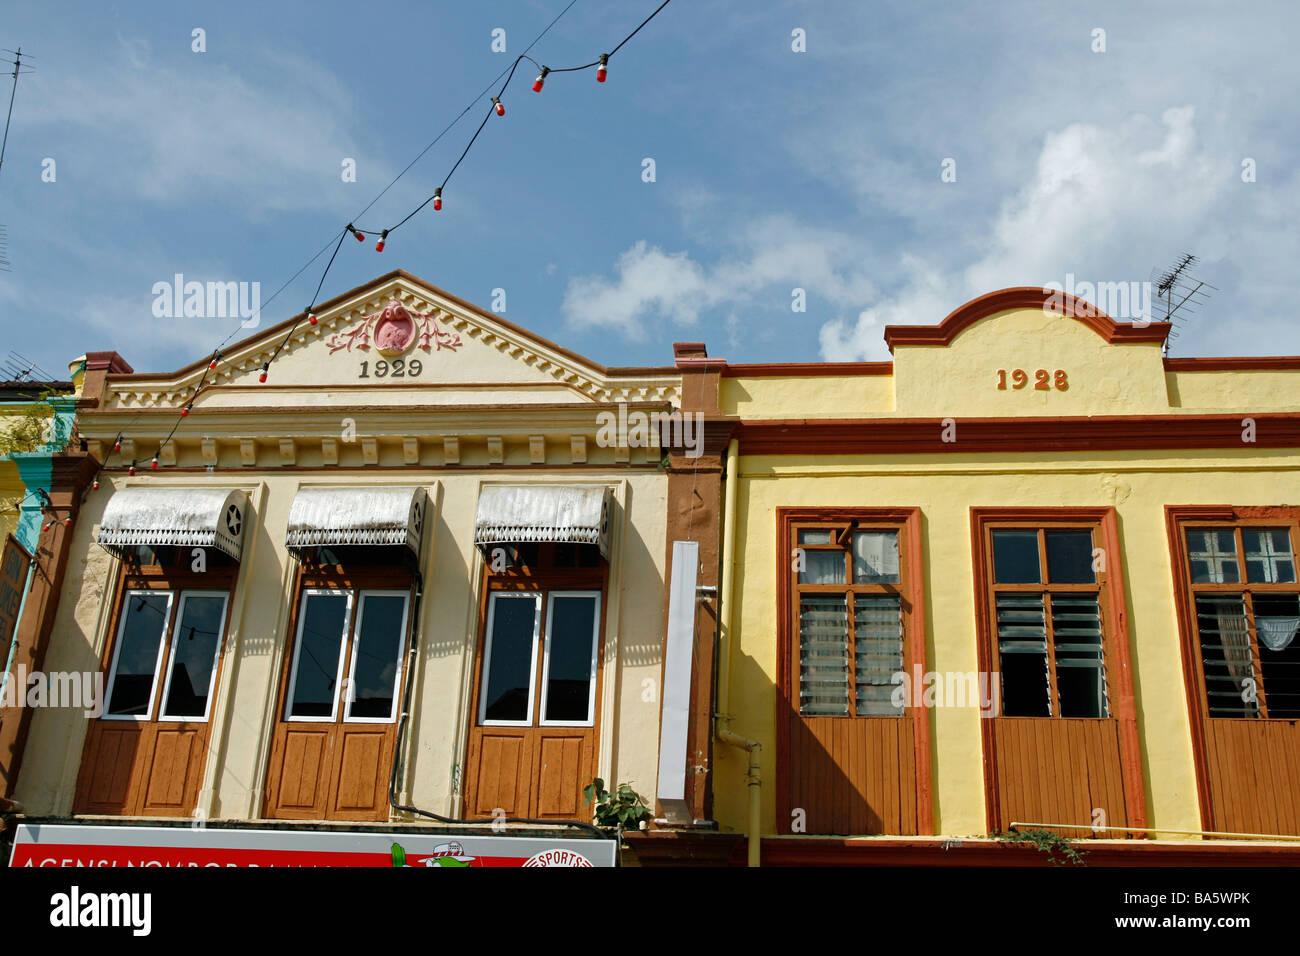 Renovated old shophouses in Kuala Lipis, Malaysia - Stock Image